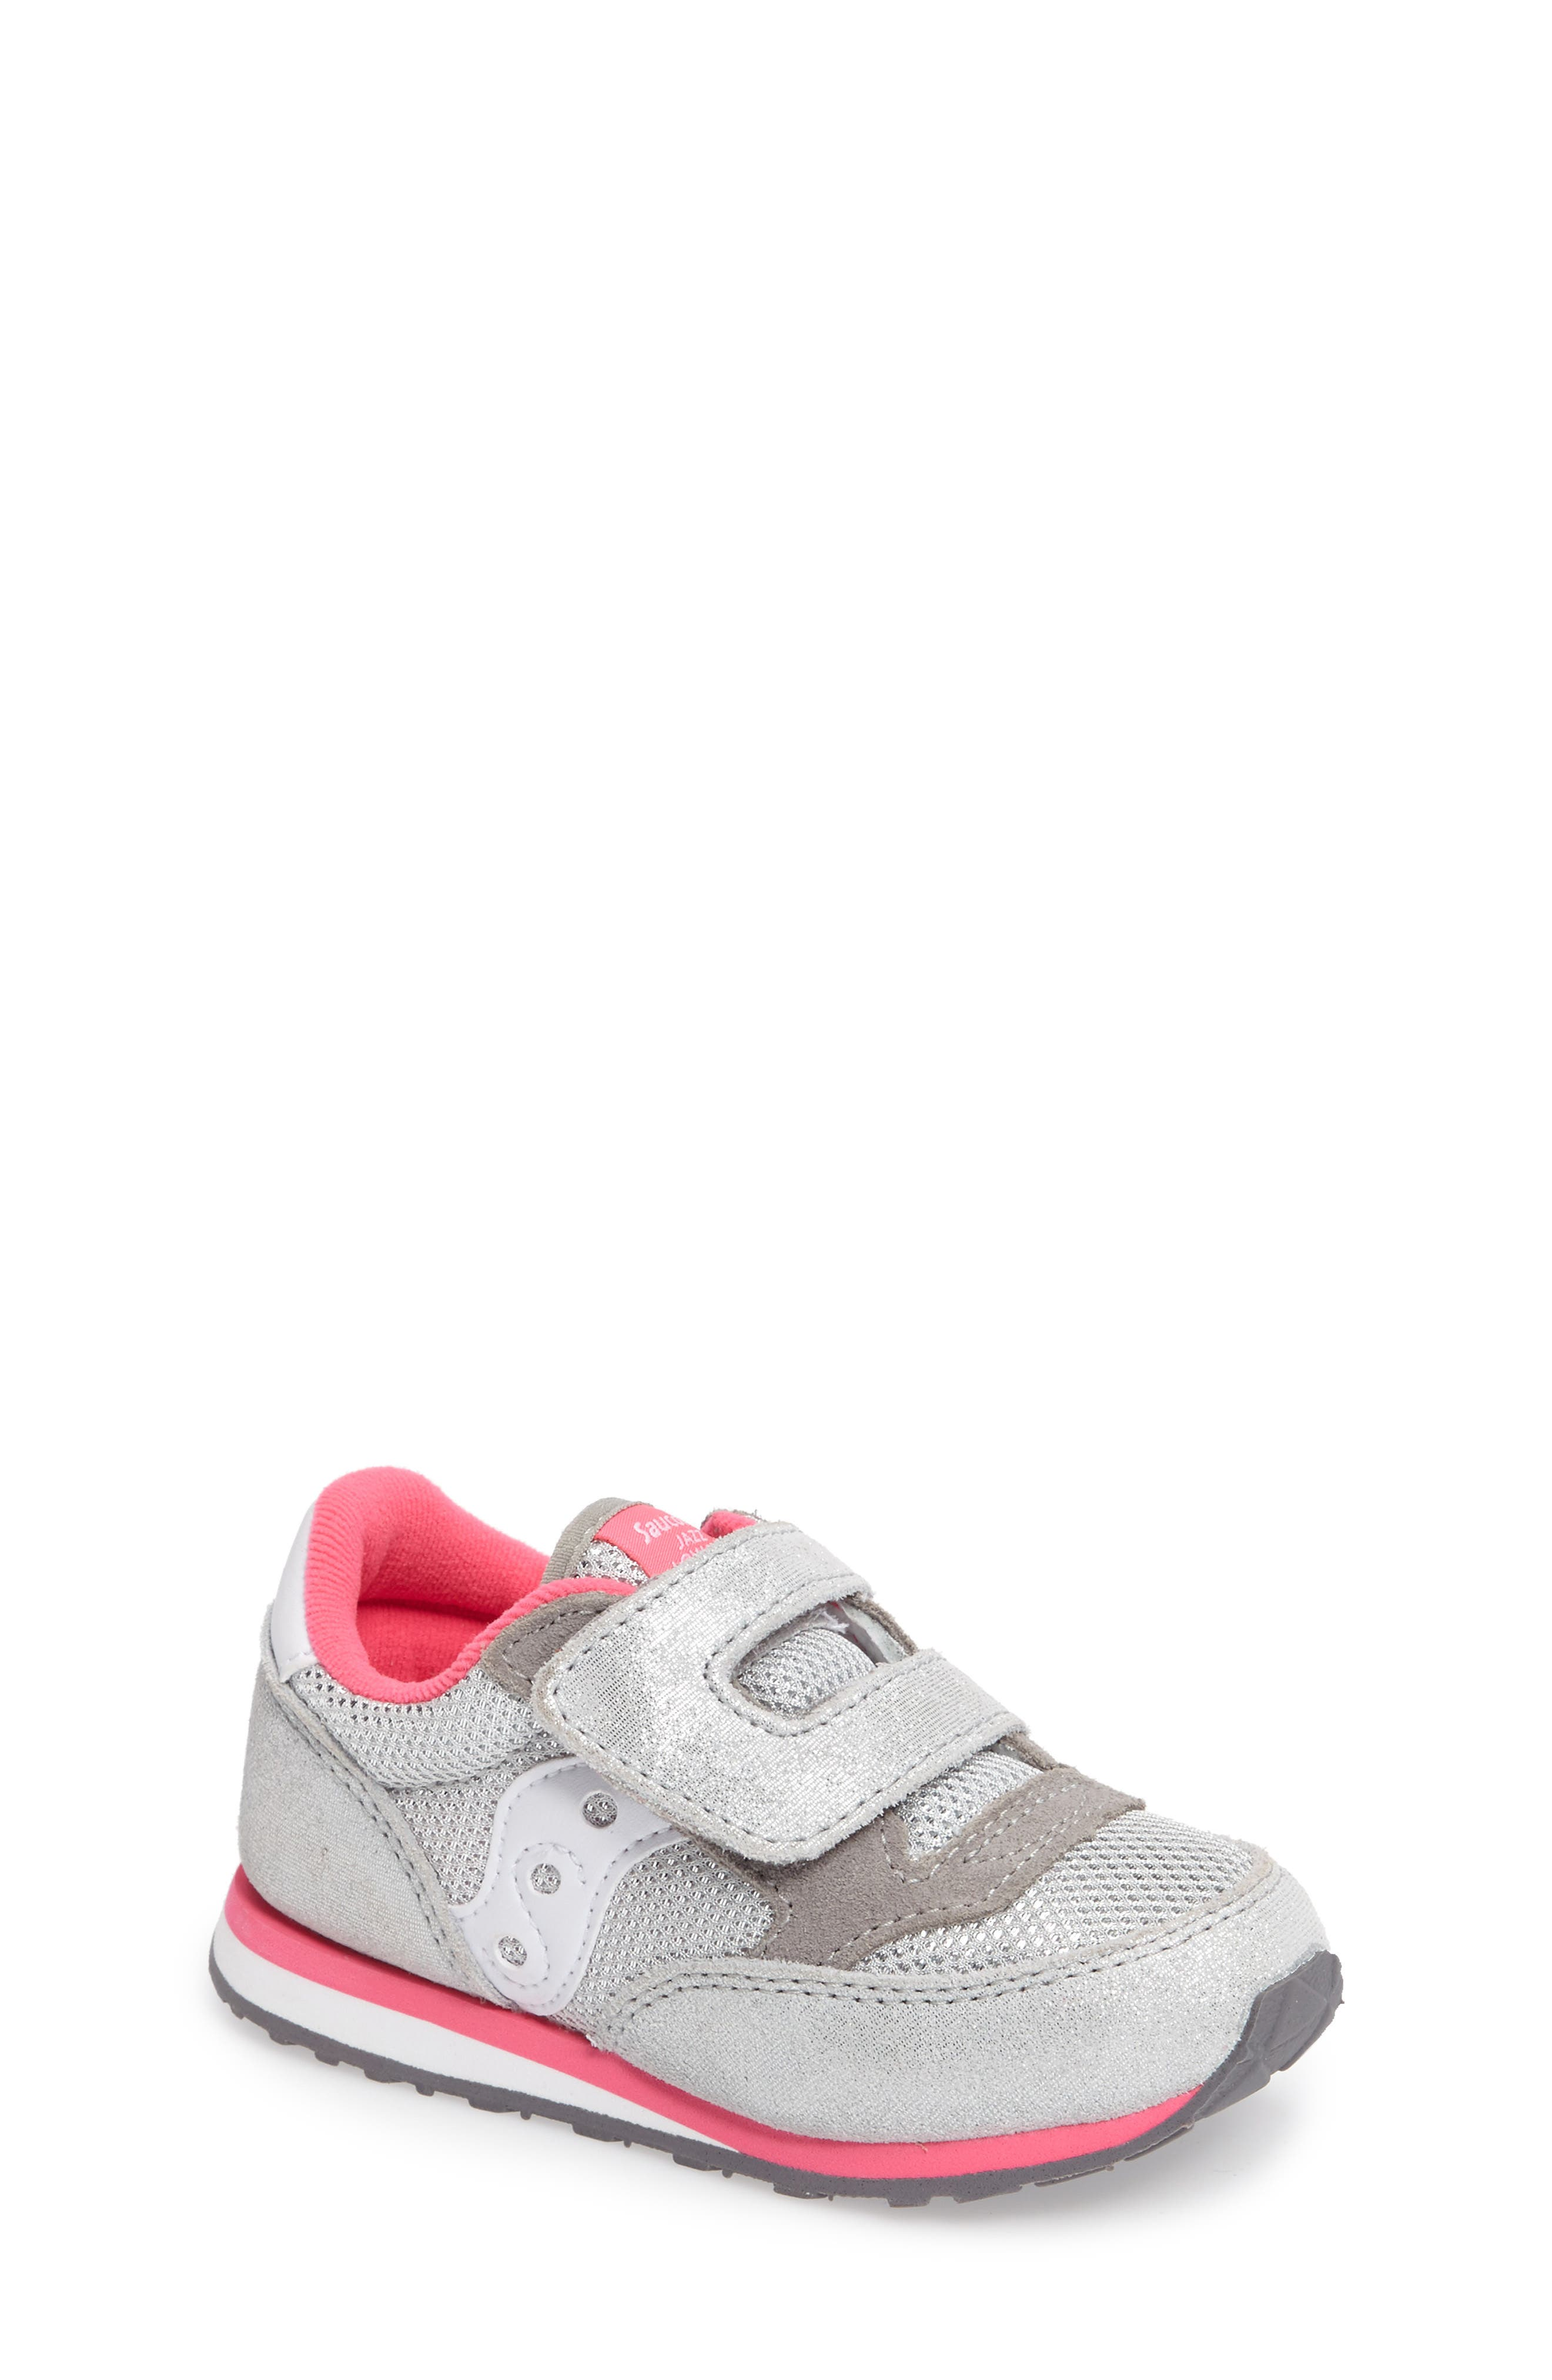 Jazz Sneaker,                         Main,                         color, 040